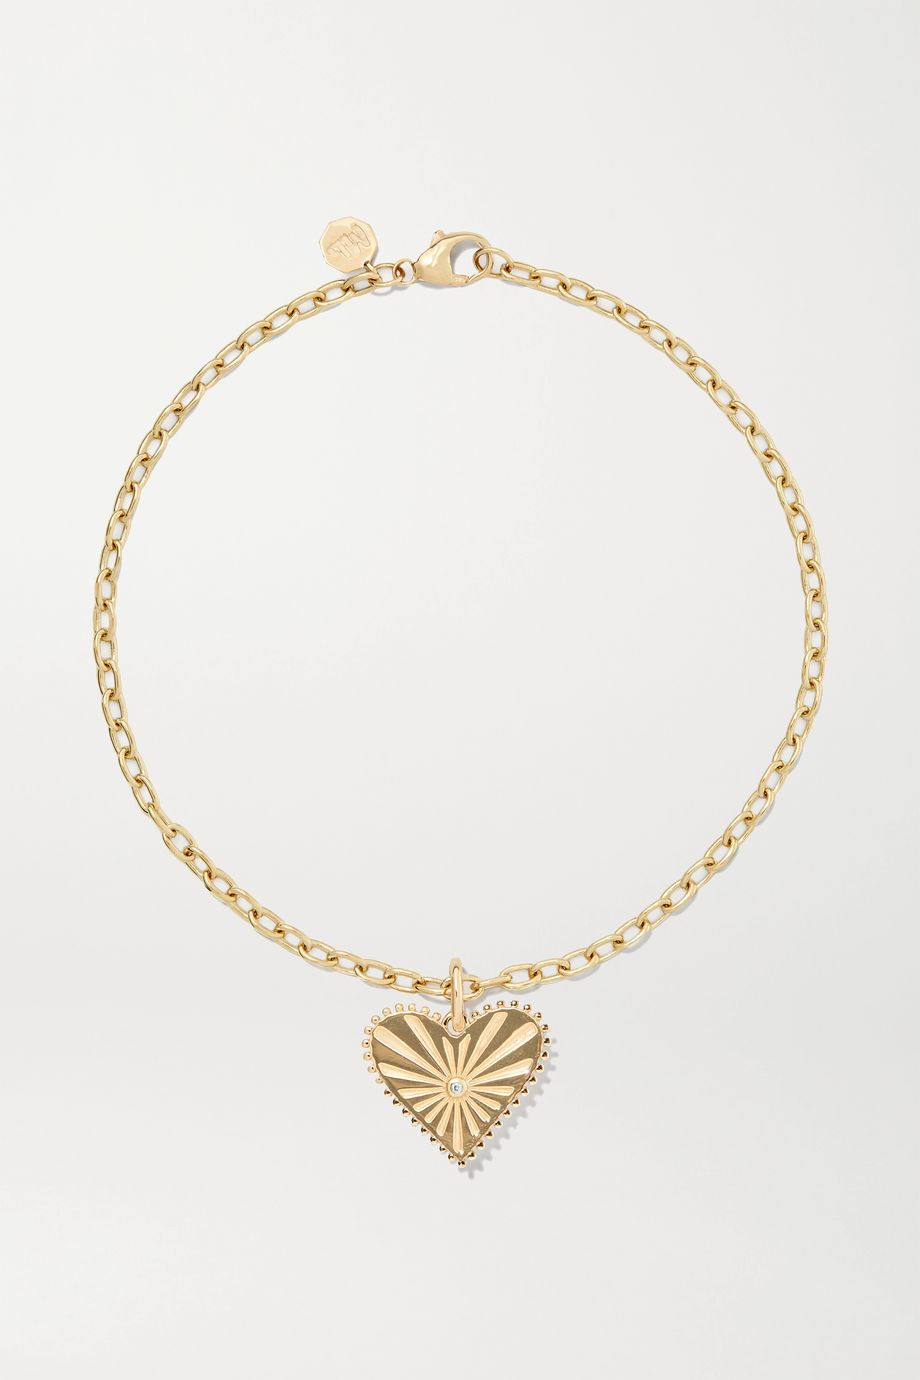 Marlo Laz Pour Toujours 14-karat gold diamond anklet